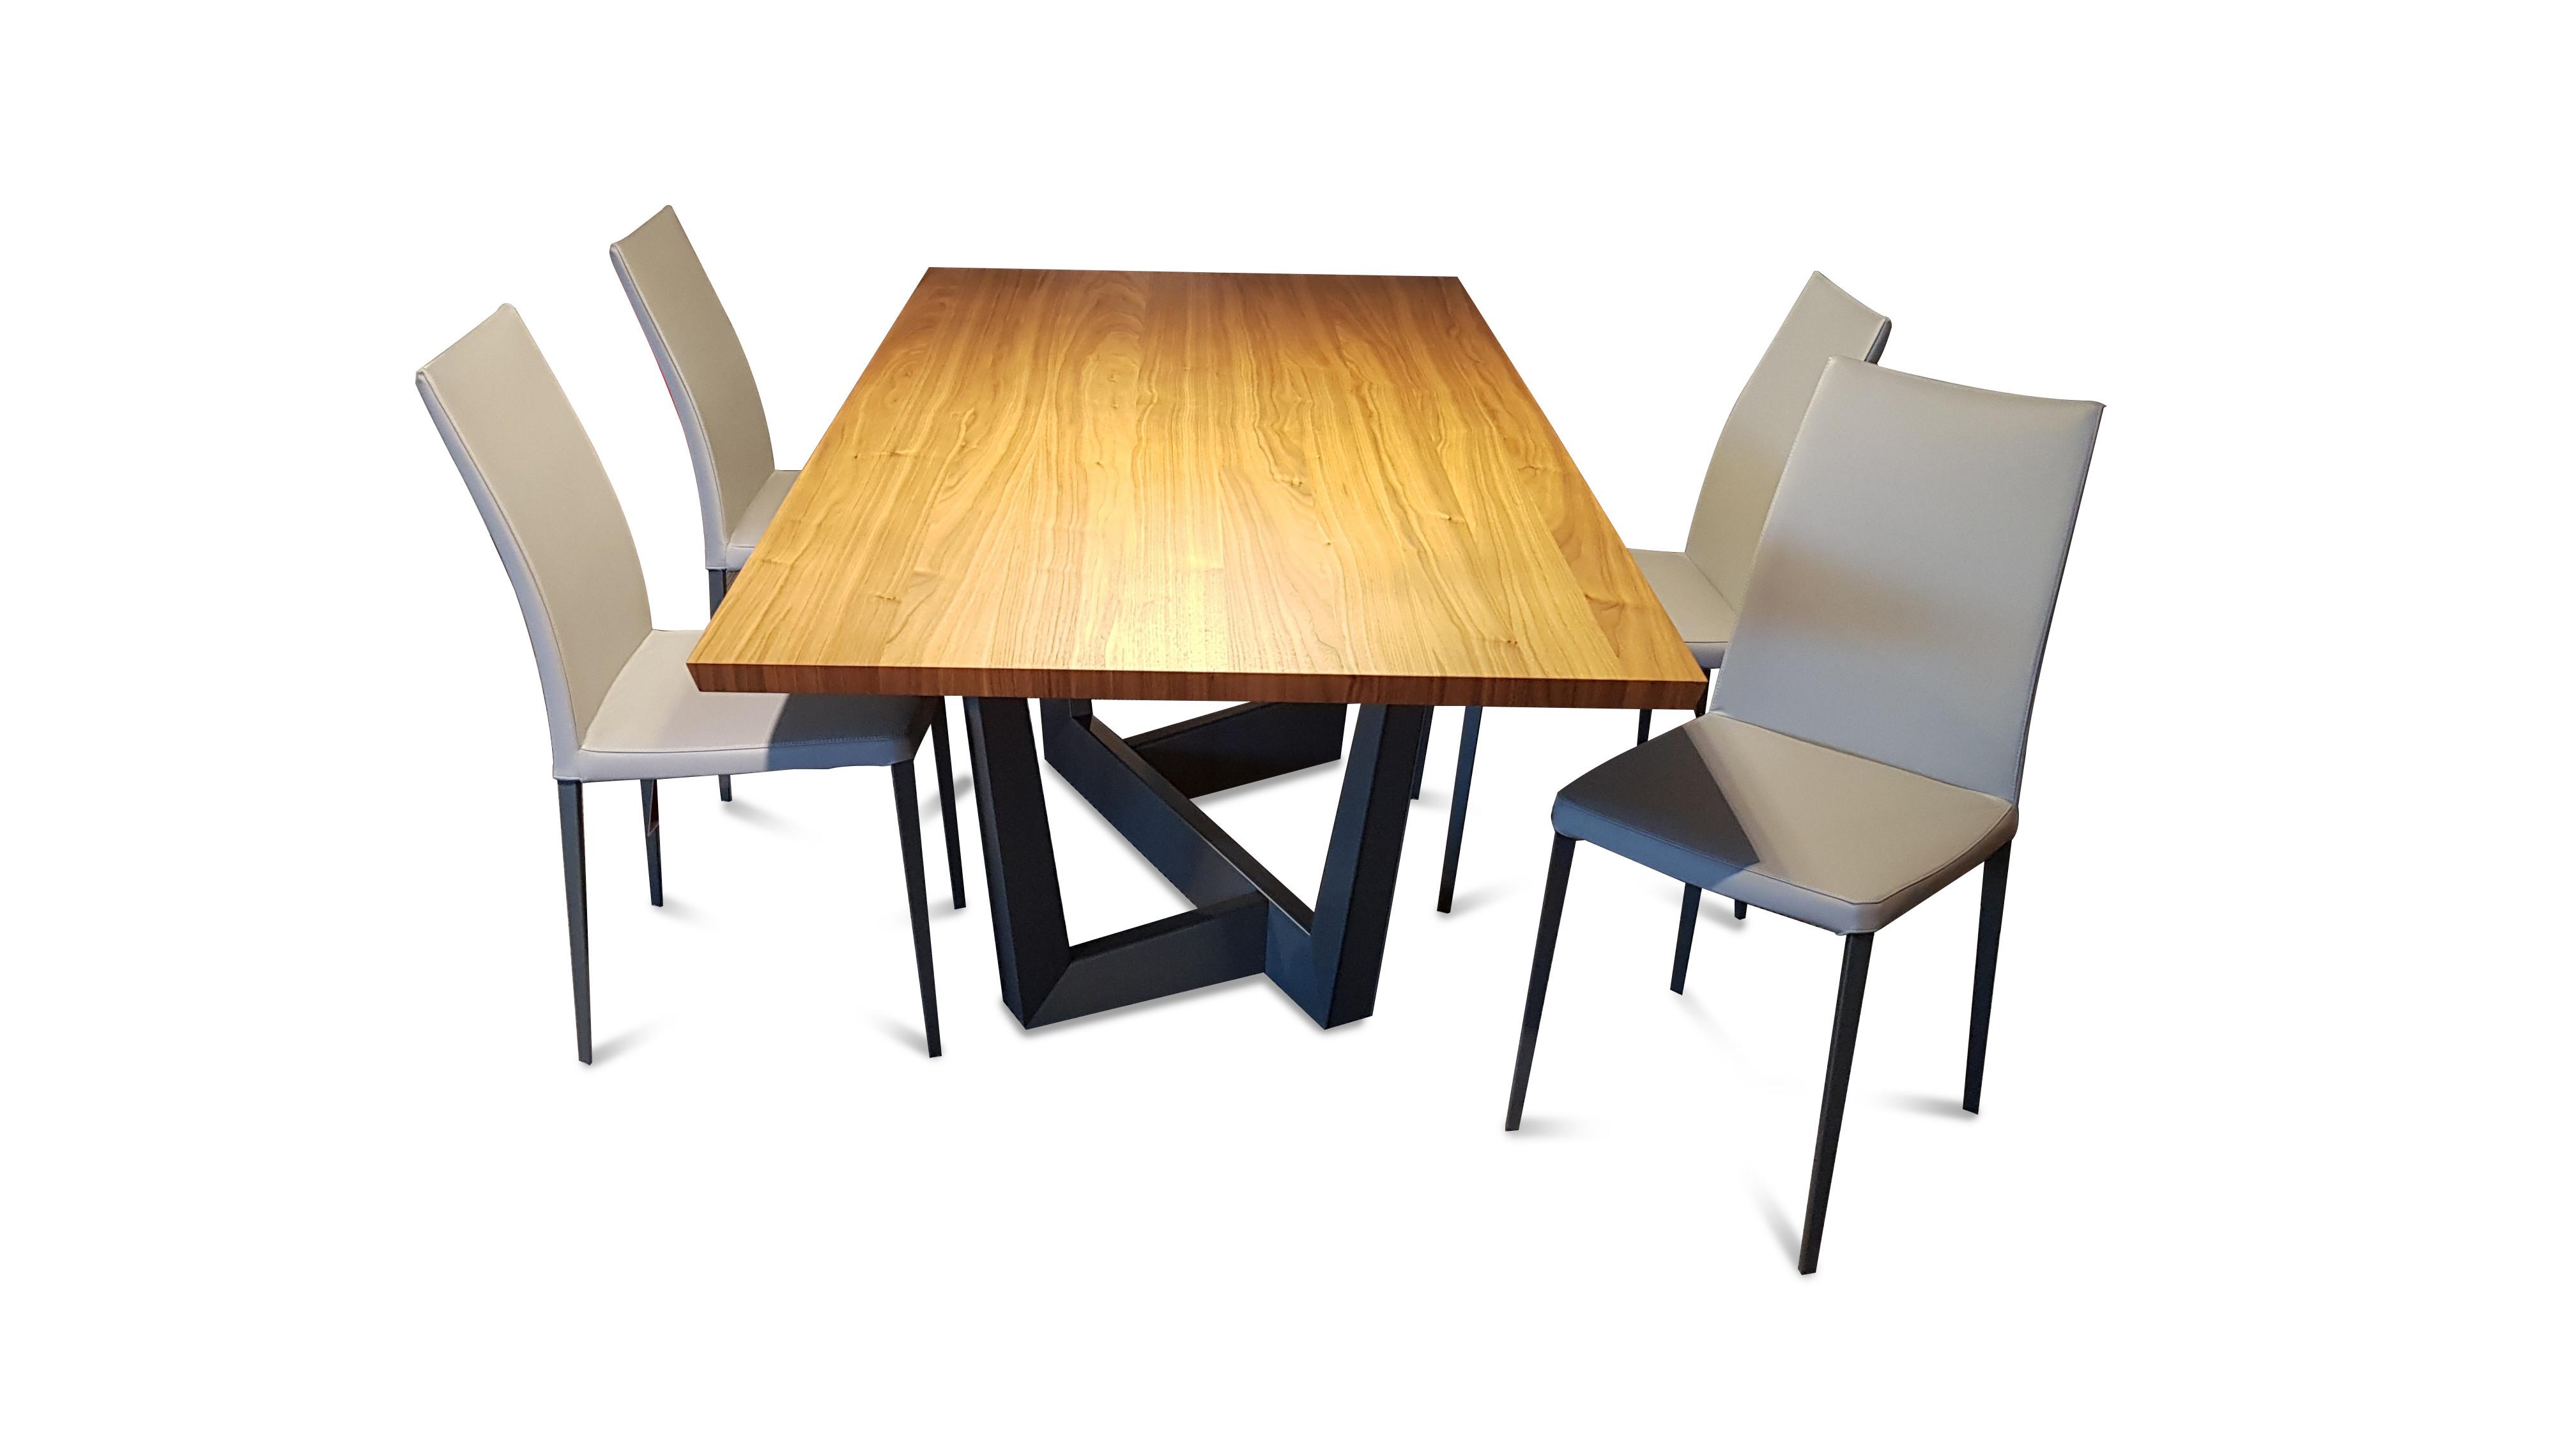 Bonaldo - Tischgruppe Art4You / Kayla Up 03